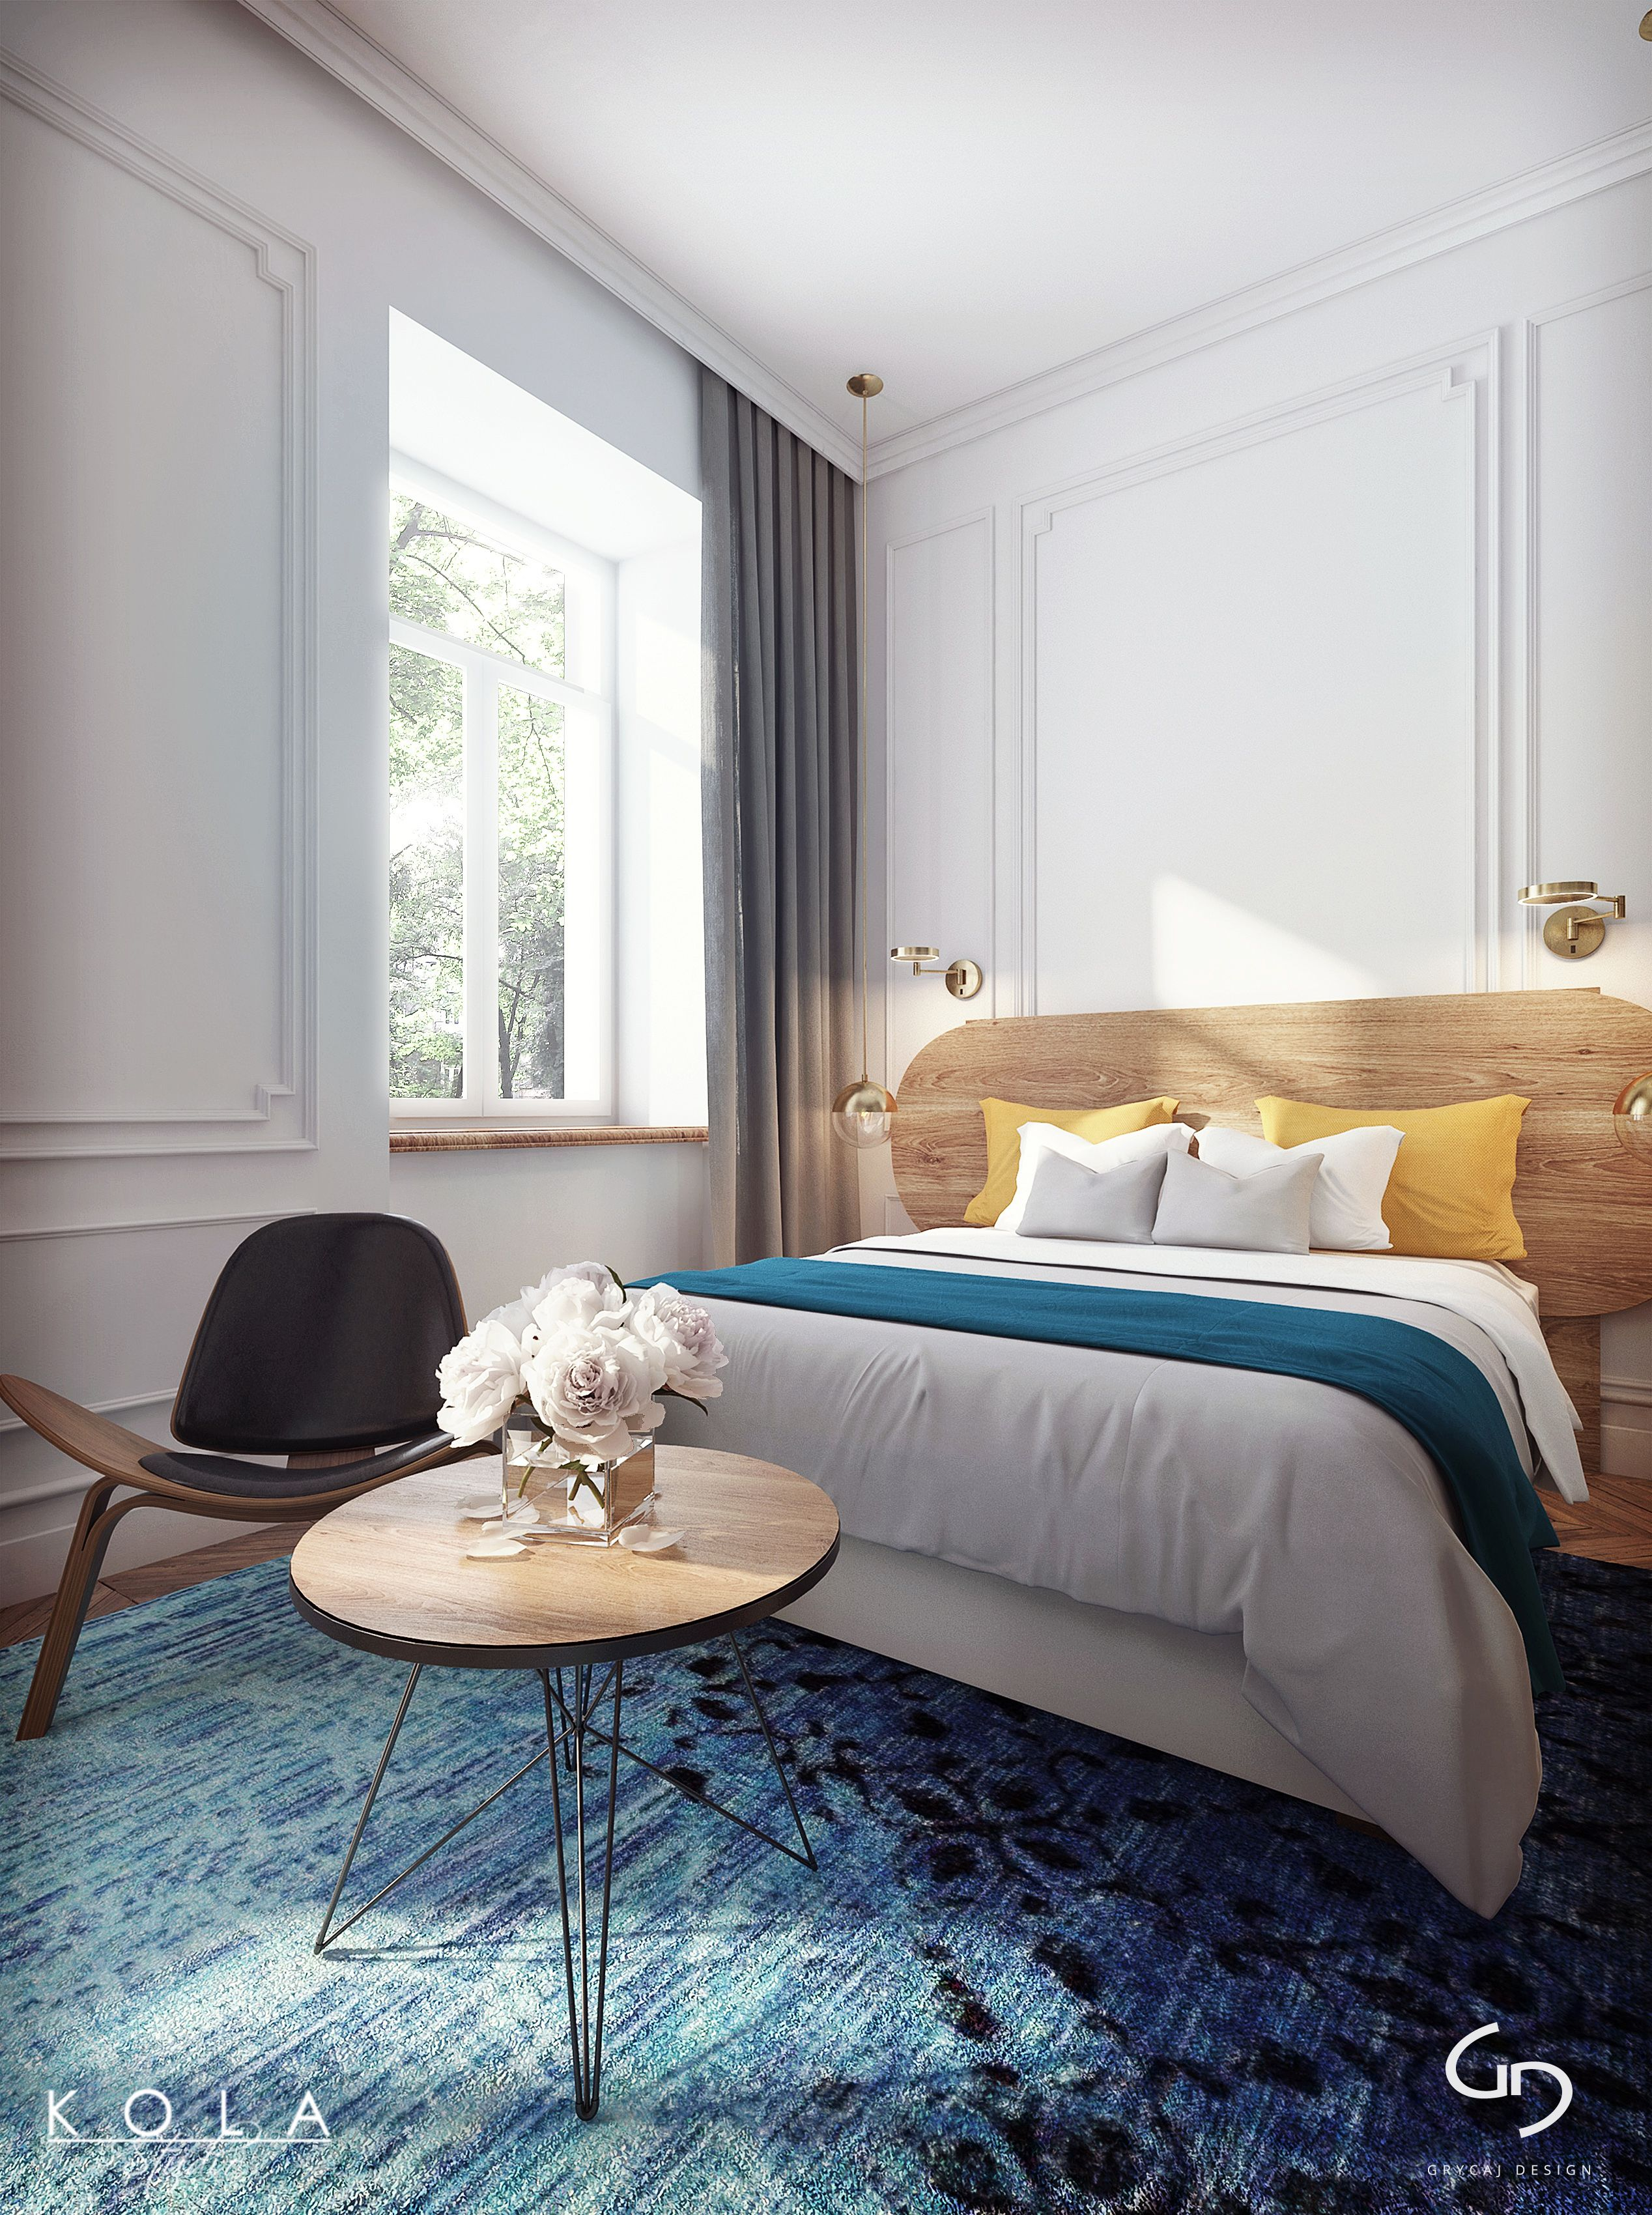 Visualizations of a boutique hotel room 3D model - Hotel room ... 30bdd14afec